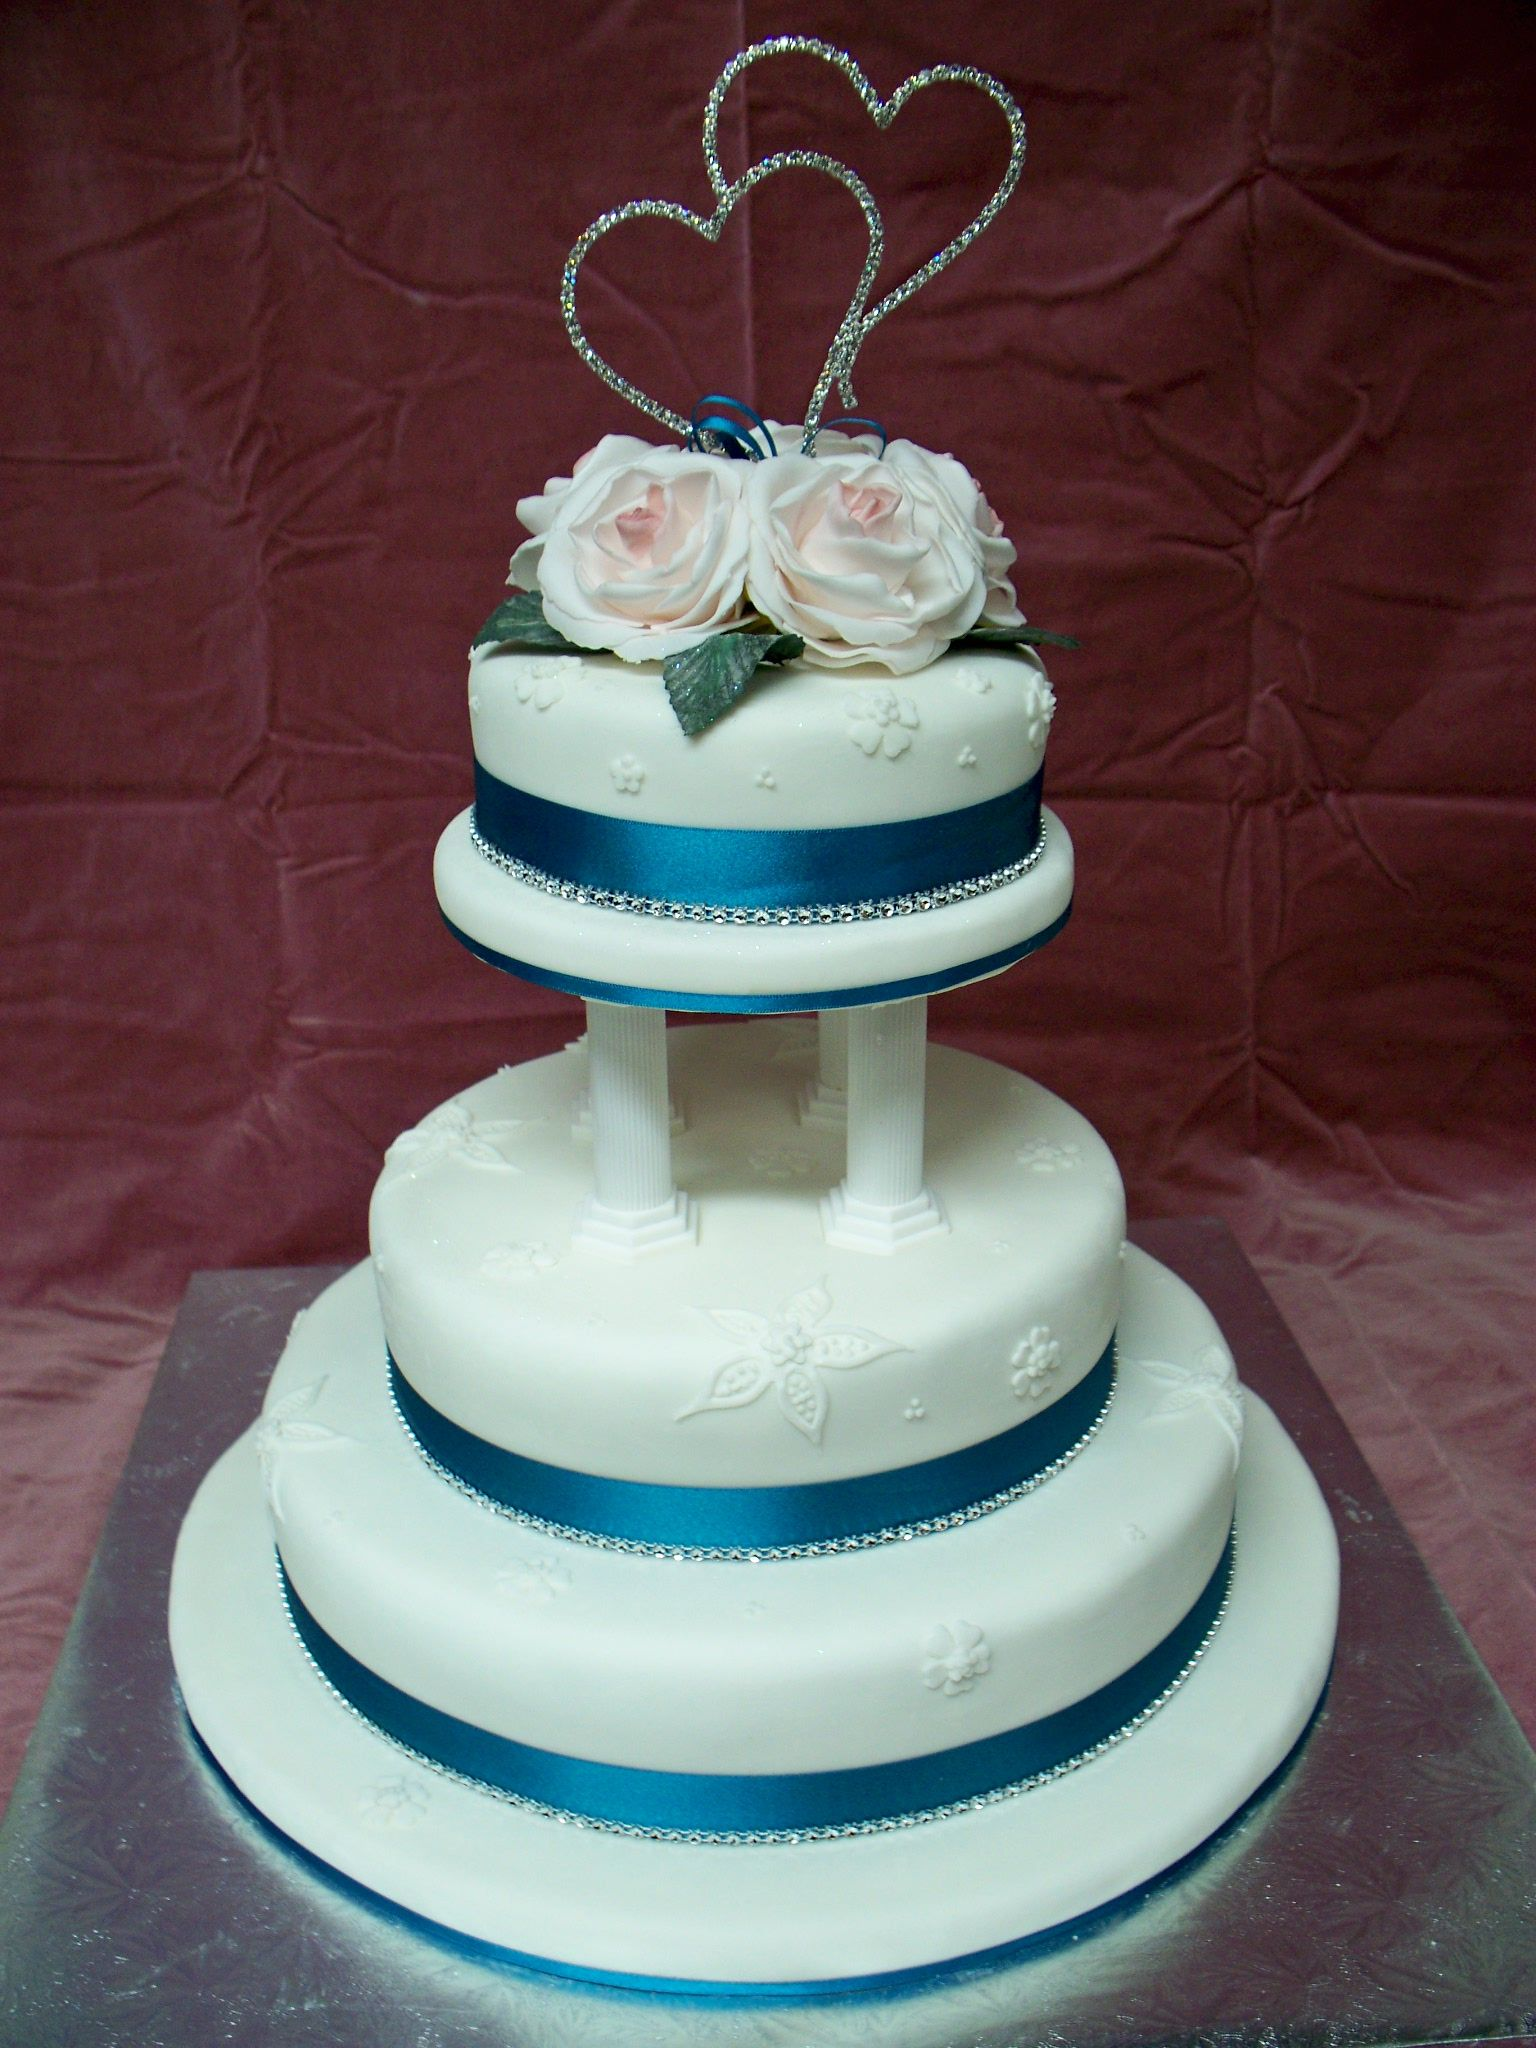 Best Wedding Cakes In Auckland New Zealand Fresco Foods Ltd Www Frescofoods Co